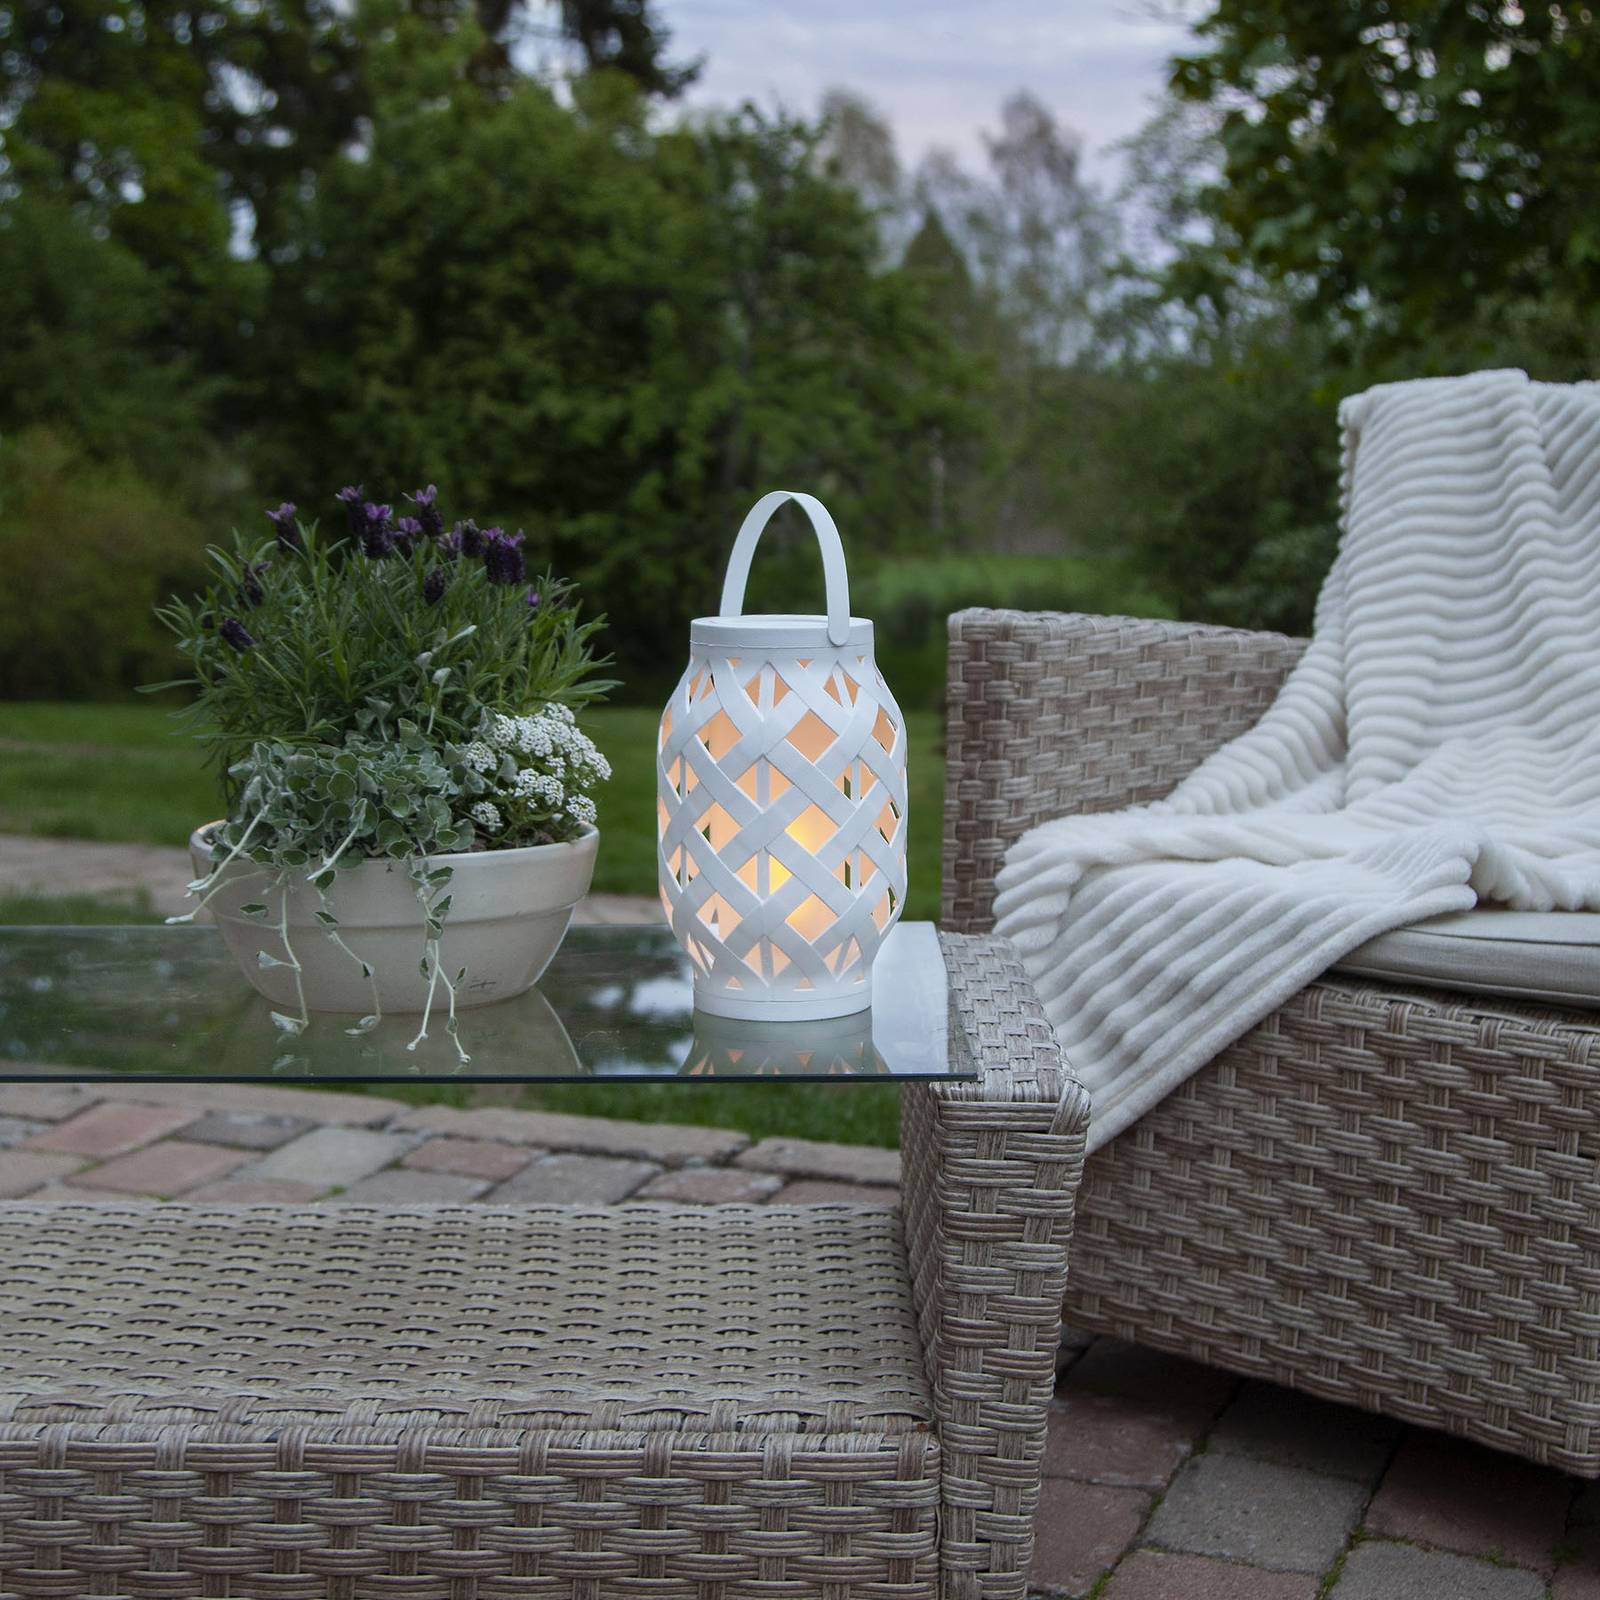 Flame Lantern -LED-lyhty, valkoinen, korkeus 23 cm